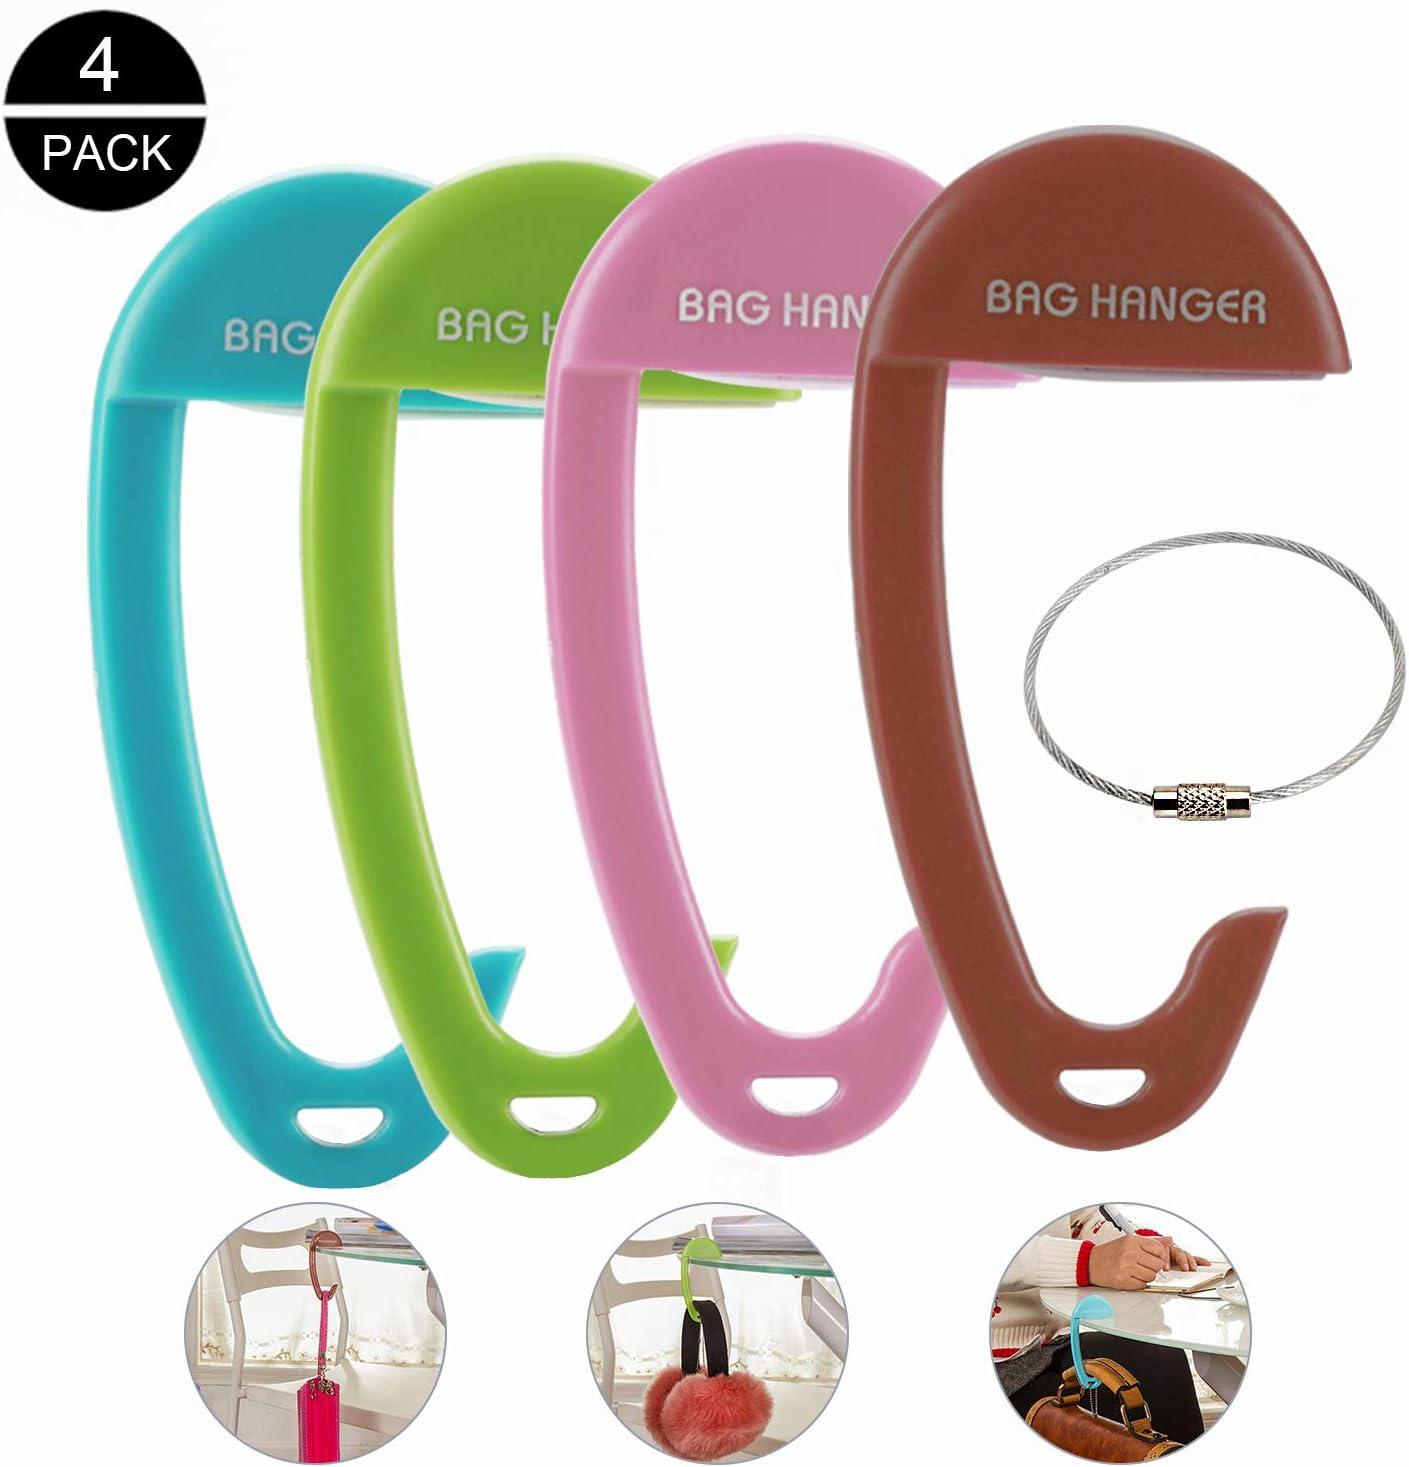 Colorful Hand Painted Canvas Shoes Pattern Table Hook Folding Bag Desk Hanger Foldable Holder